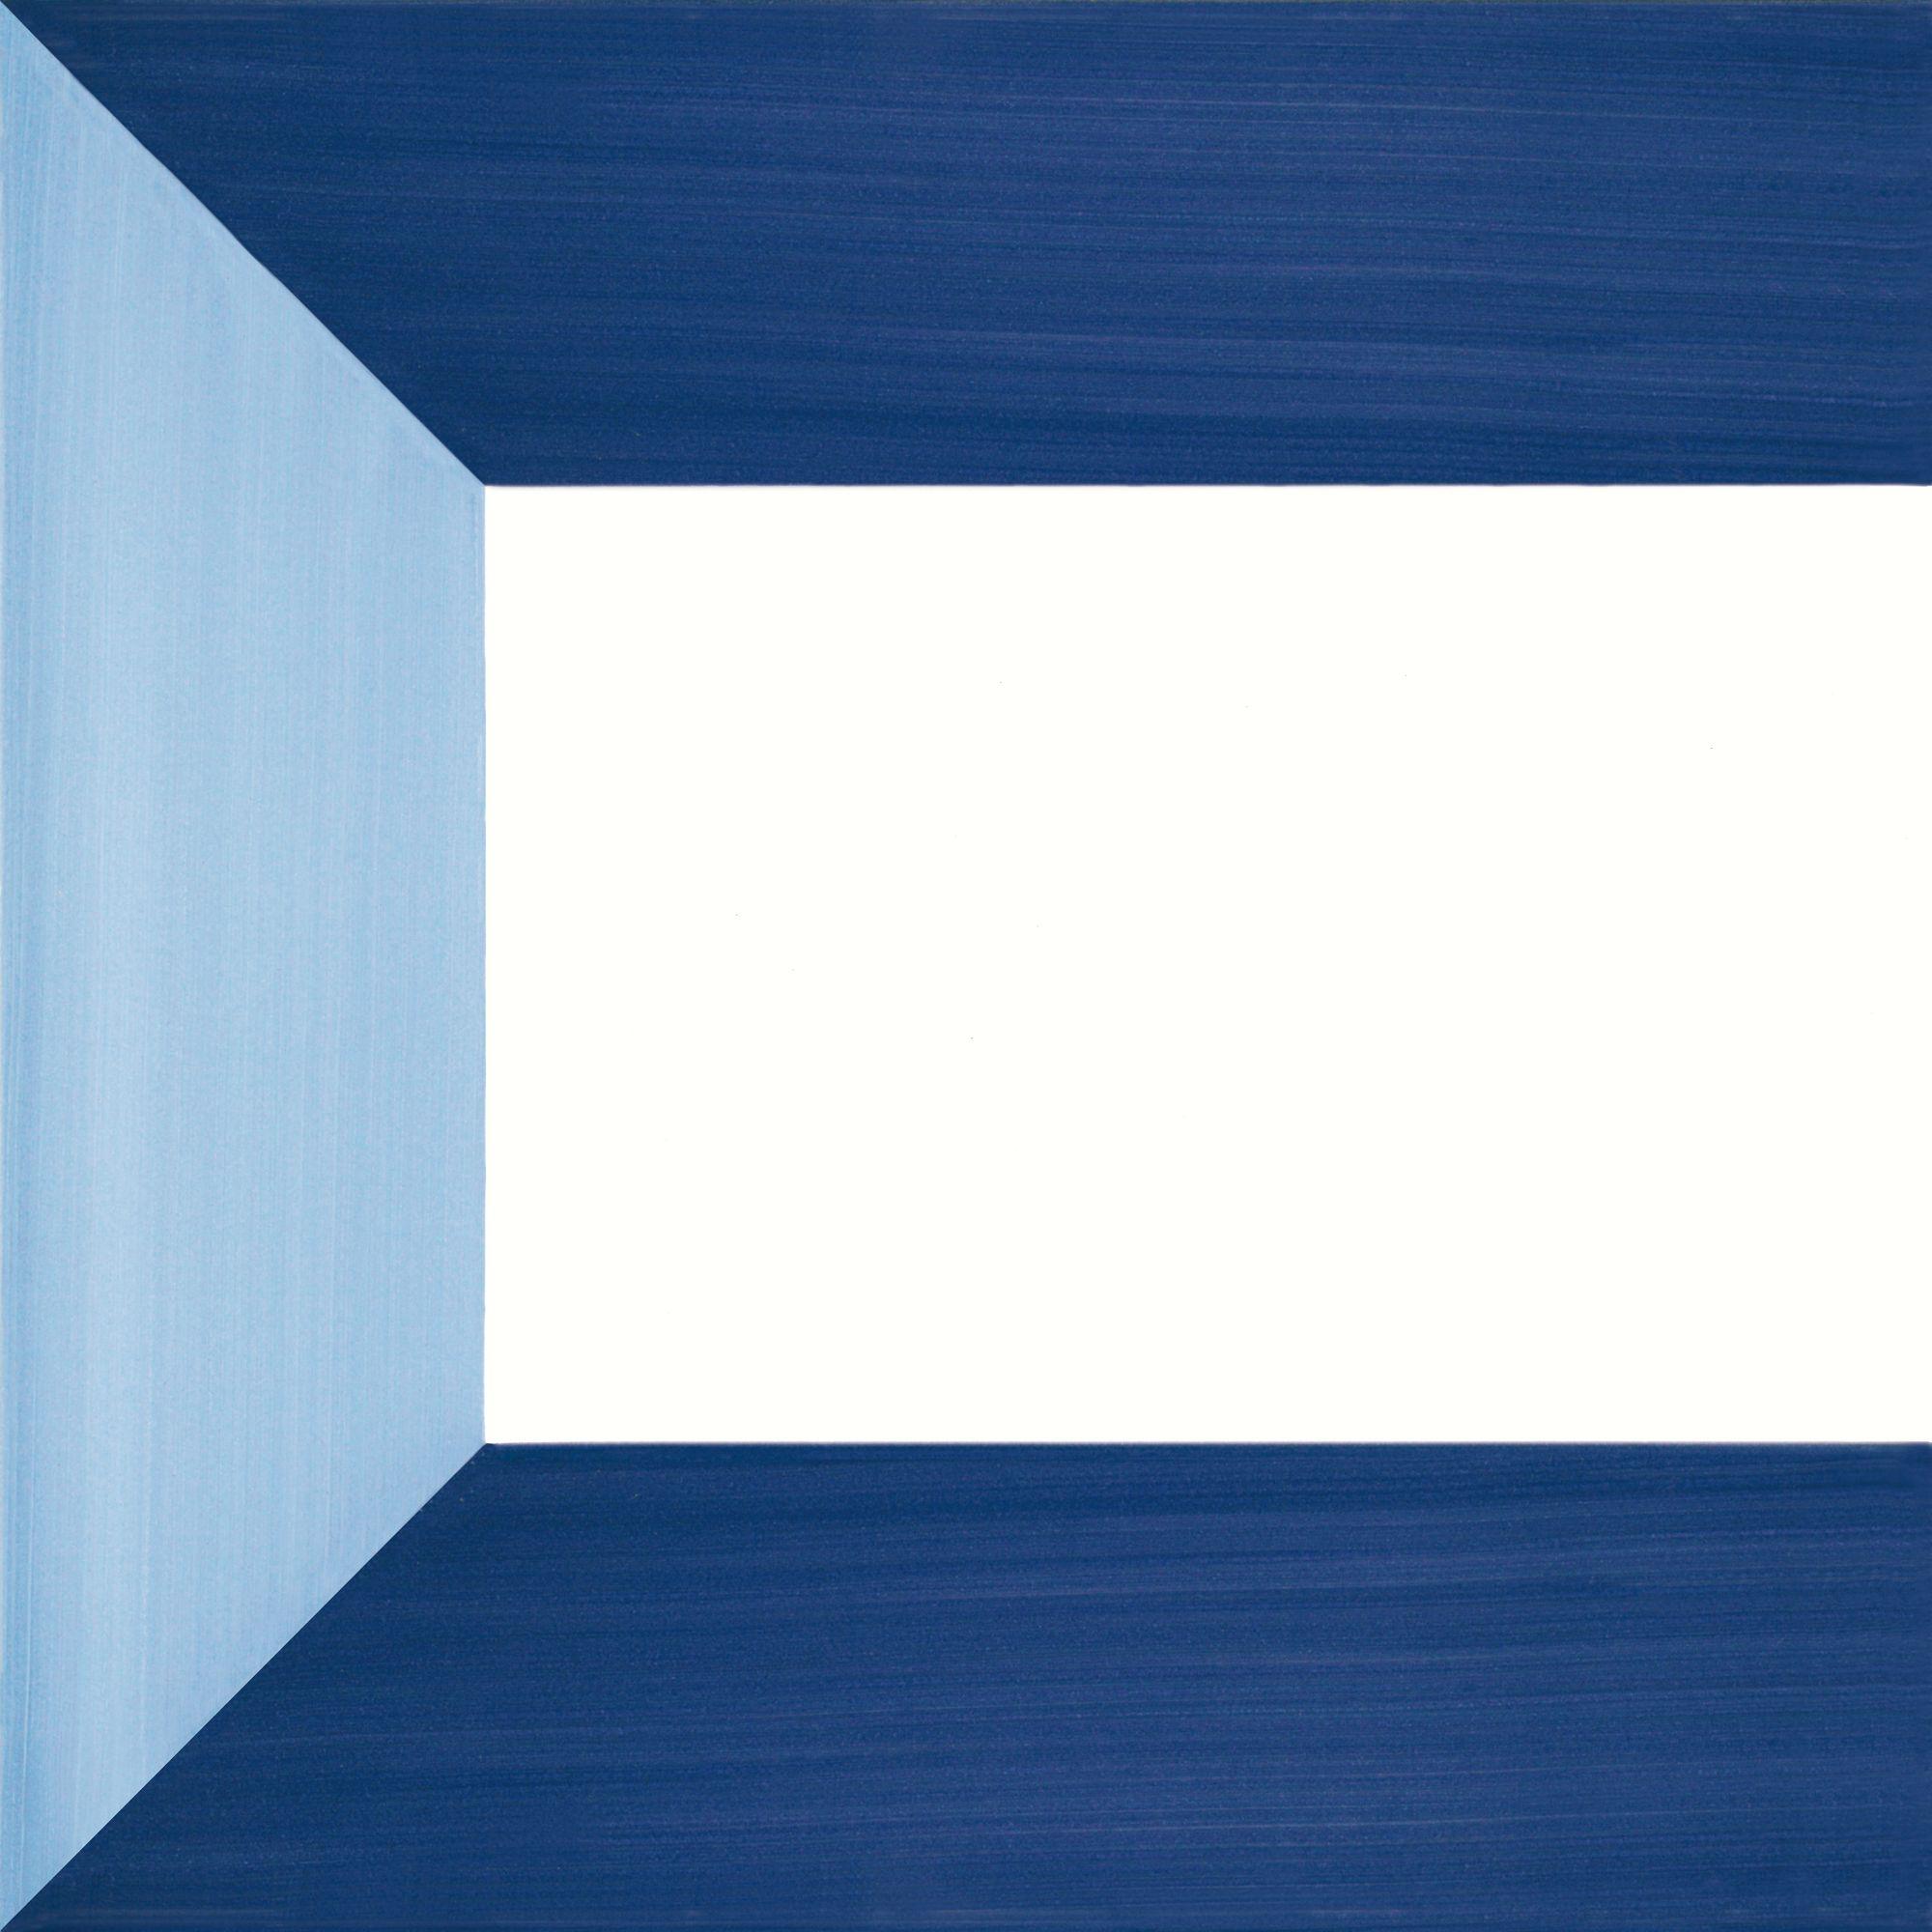 blu-ponti-decoro-tipo-14